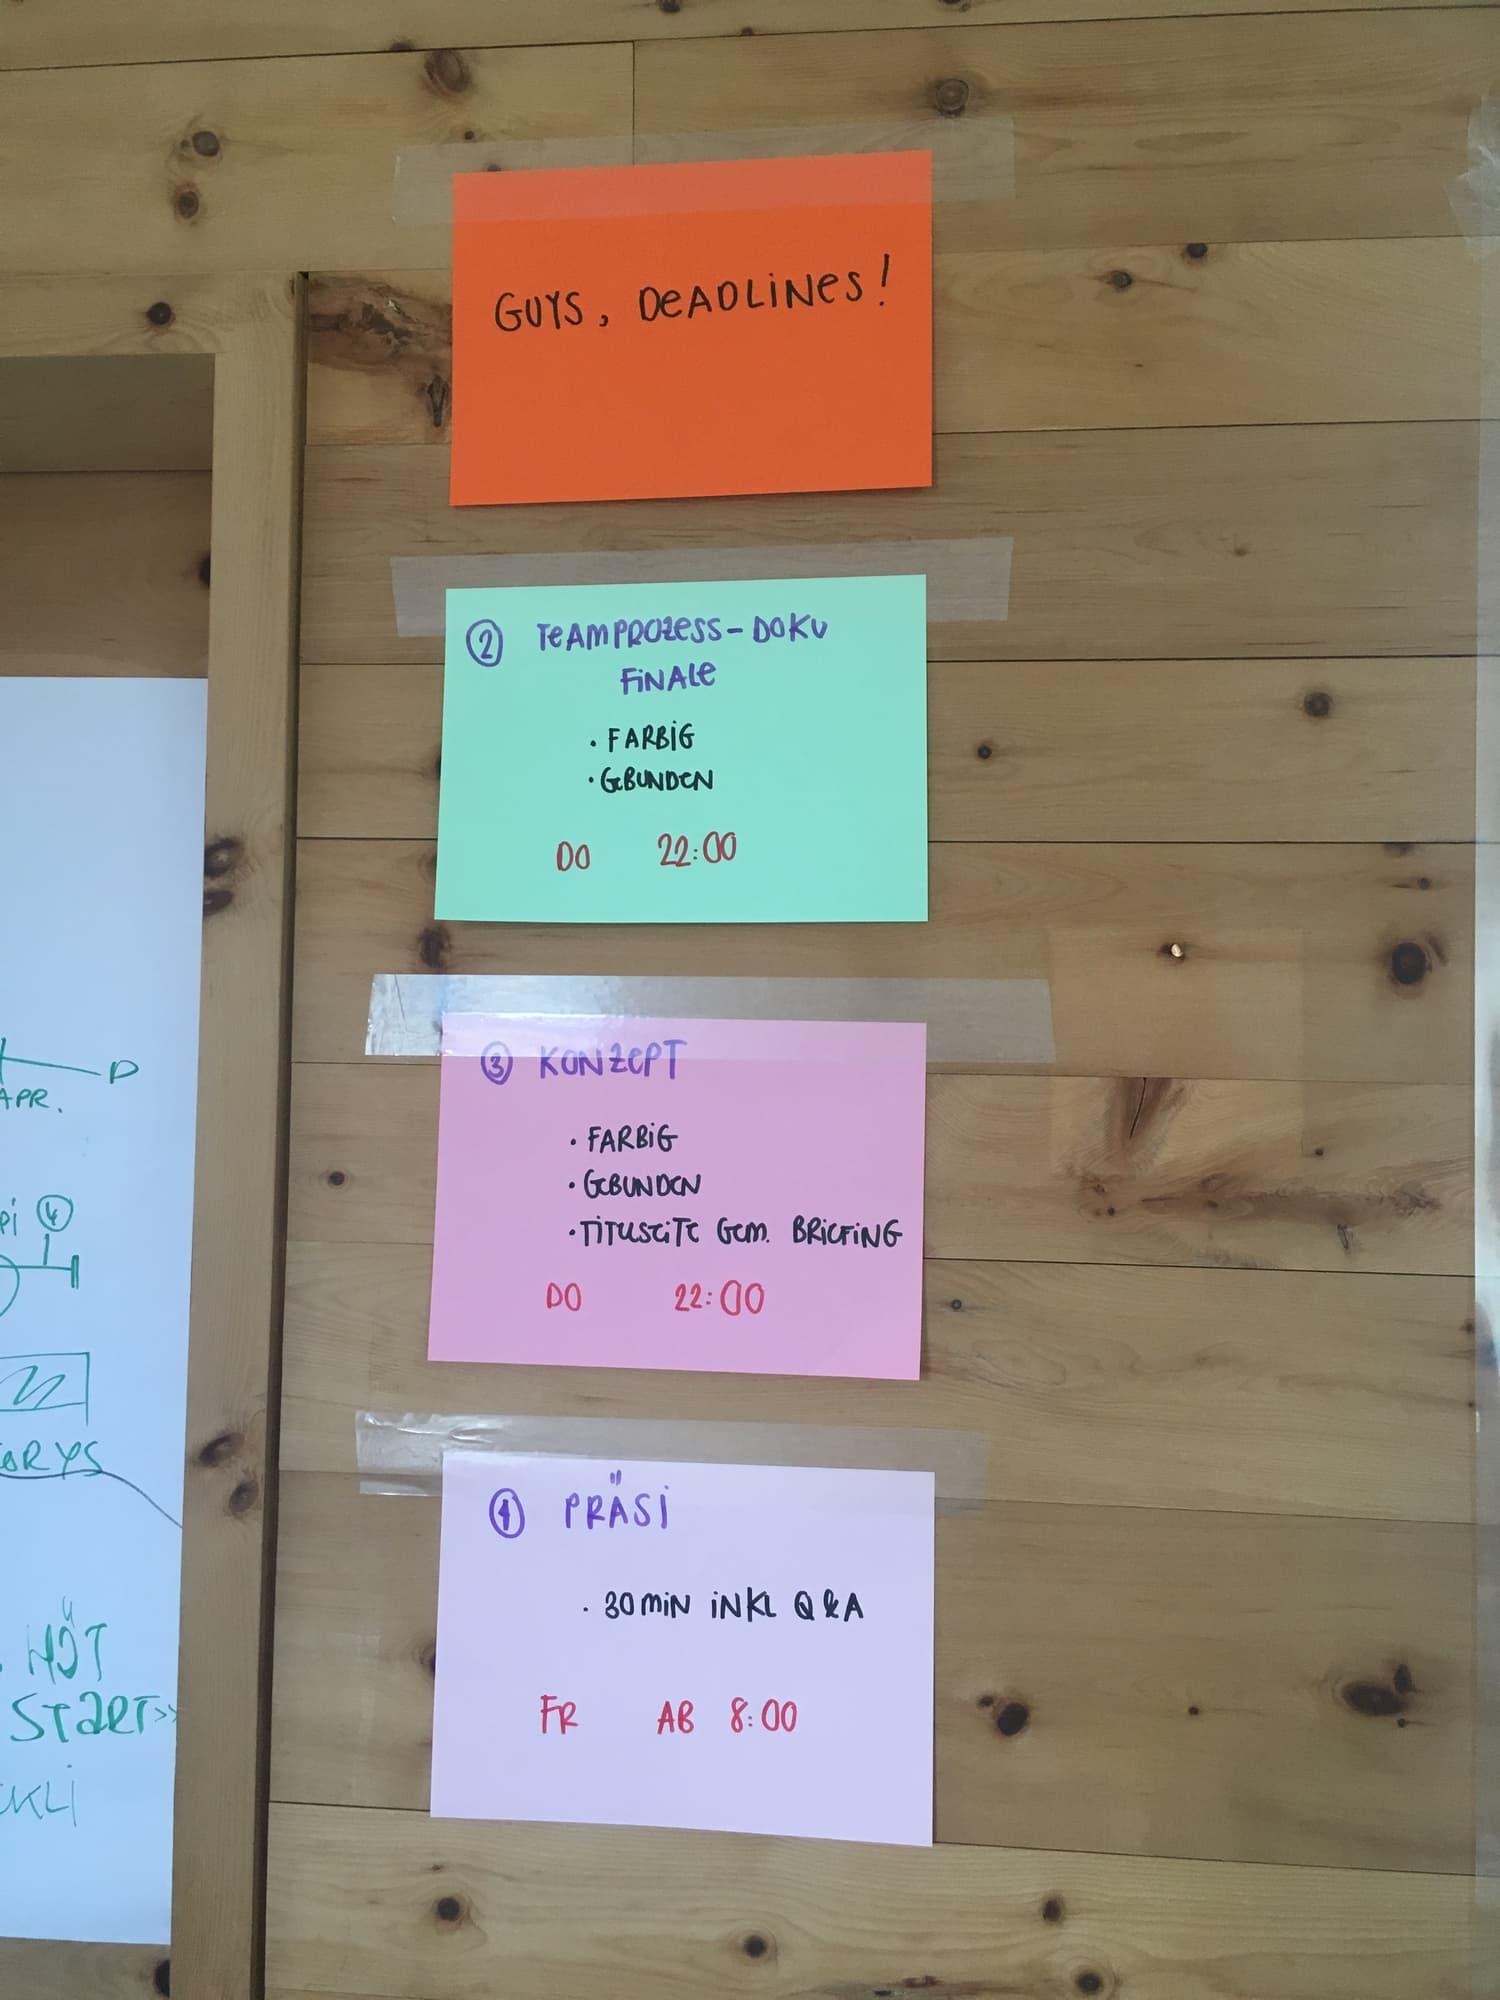 Deadlines Projektmanagementseminar Scuol